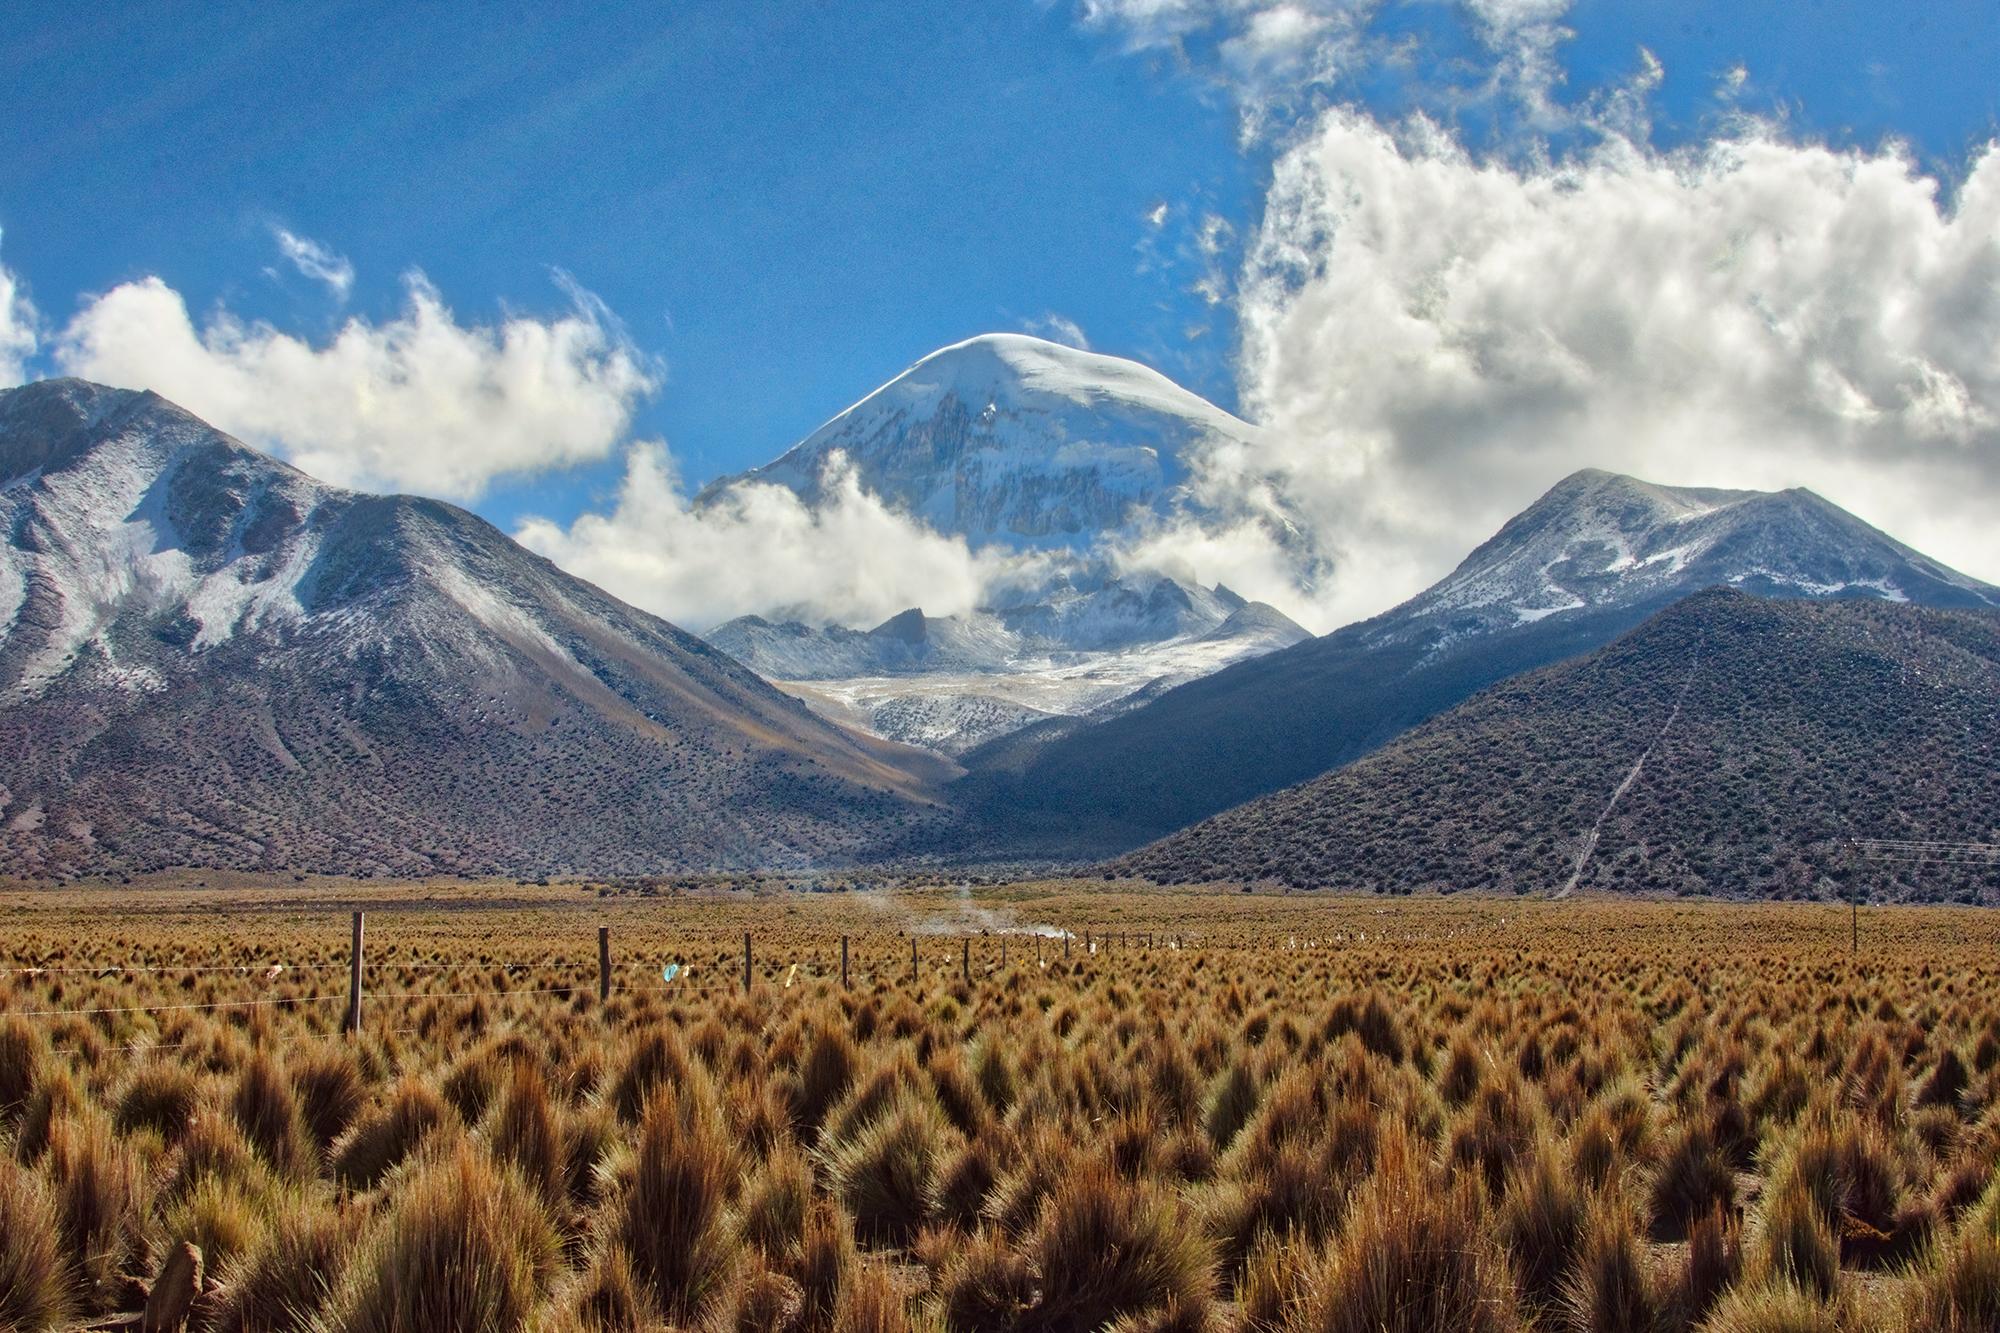 Bolivia's highest peak: Mount Sajama